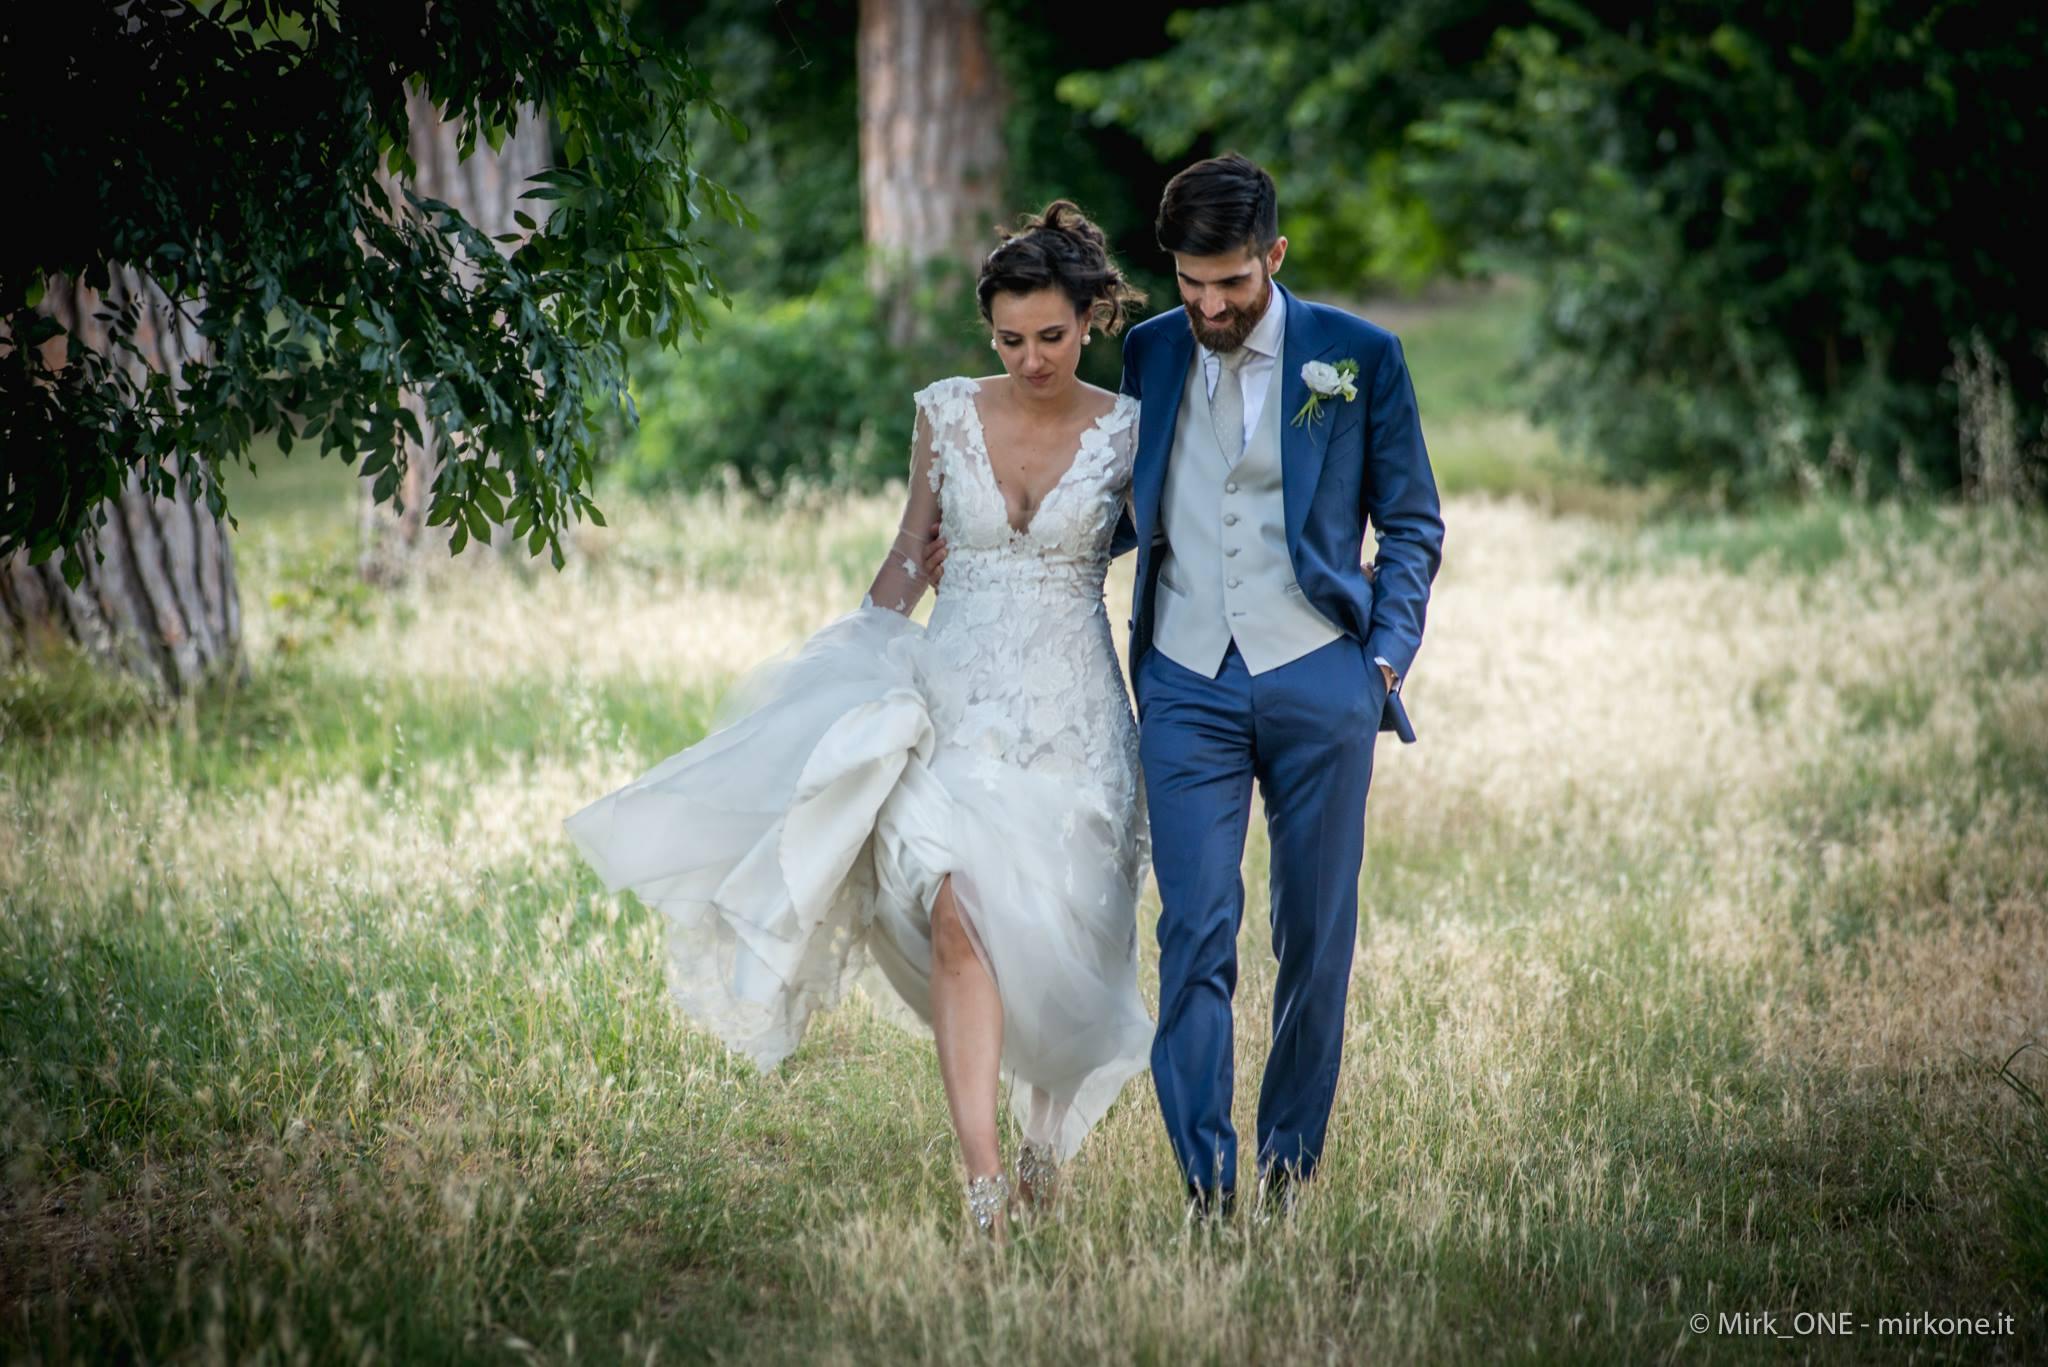 https://lnx.mirkone.it/wp-content/uploads/2015/07/mirk_ONE-fotografo-matrimonio-00107.jpg